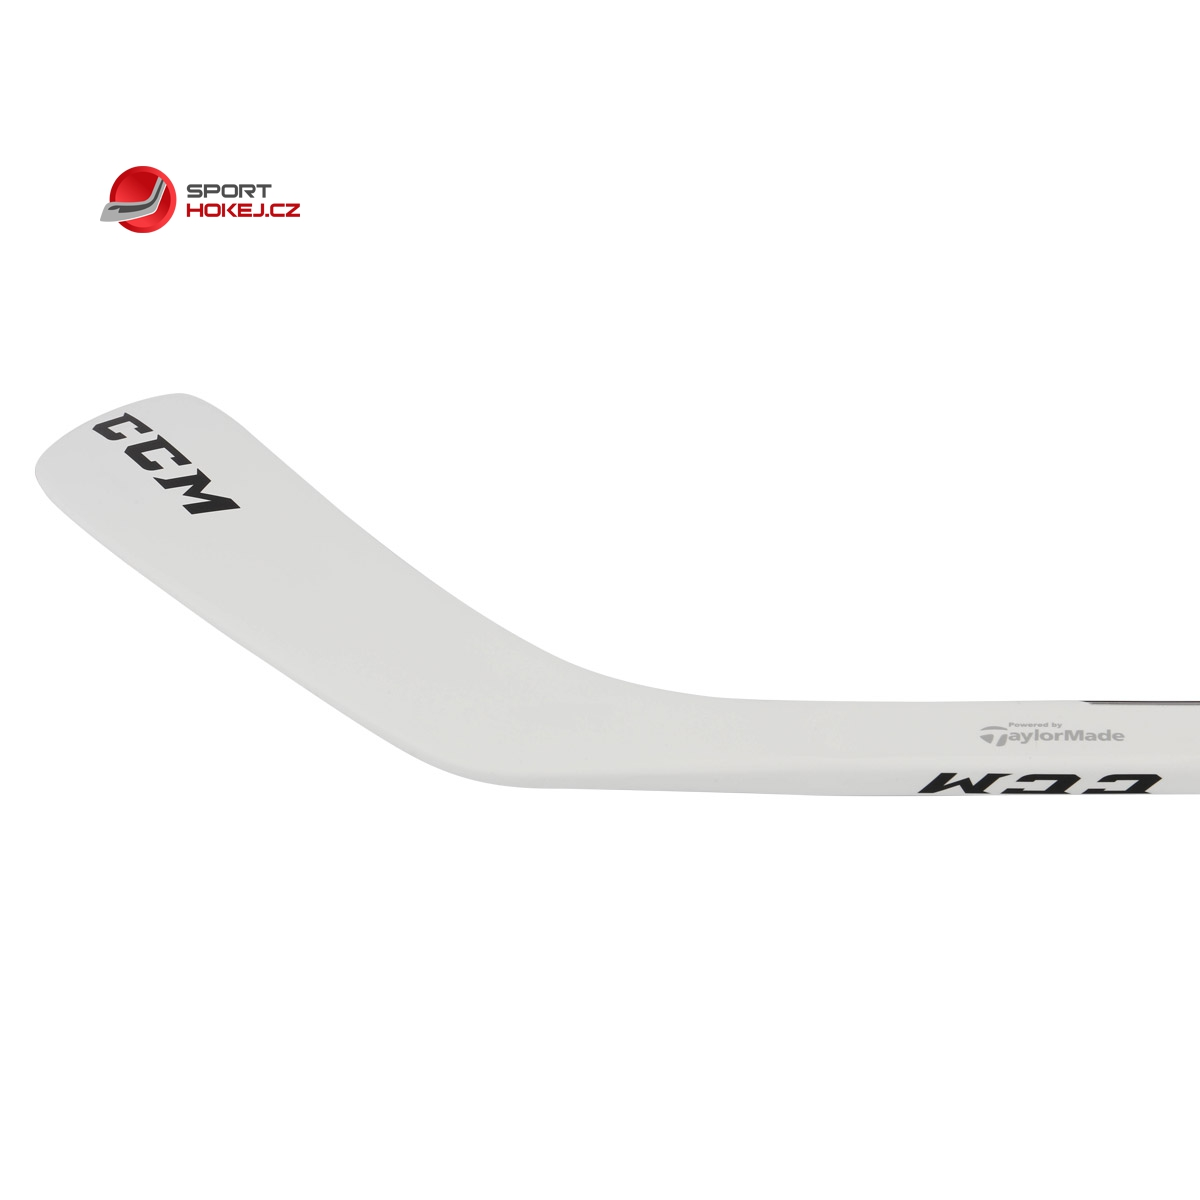 ihan kiva tukkukauppa parhaat hinnat Hokejka CCM RBZ 270 SR | SPORTHOKEJ.CZ